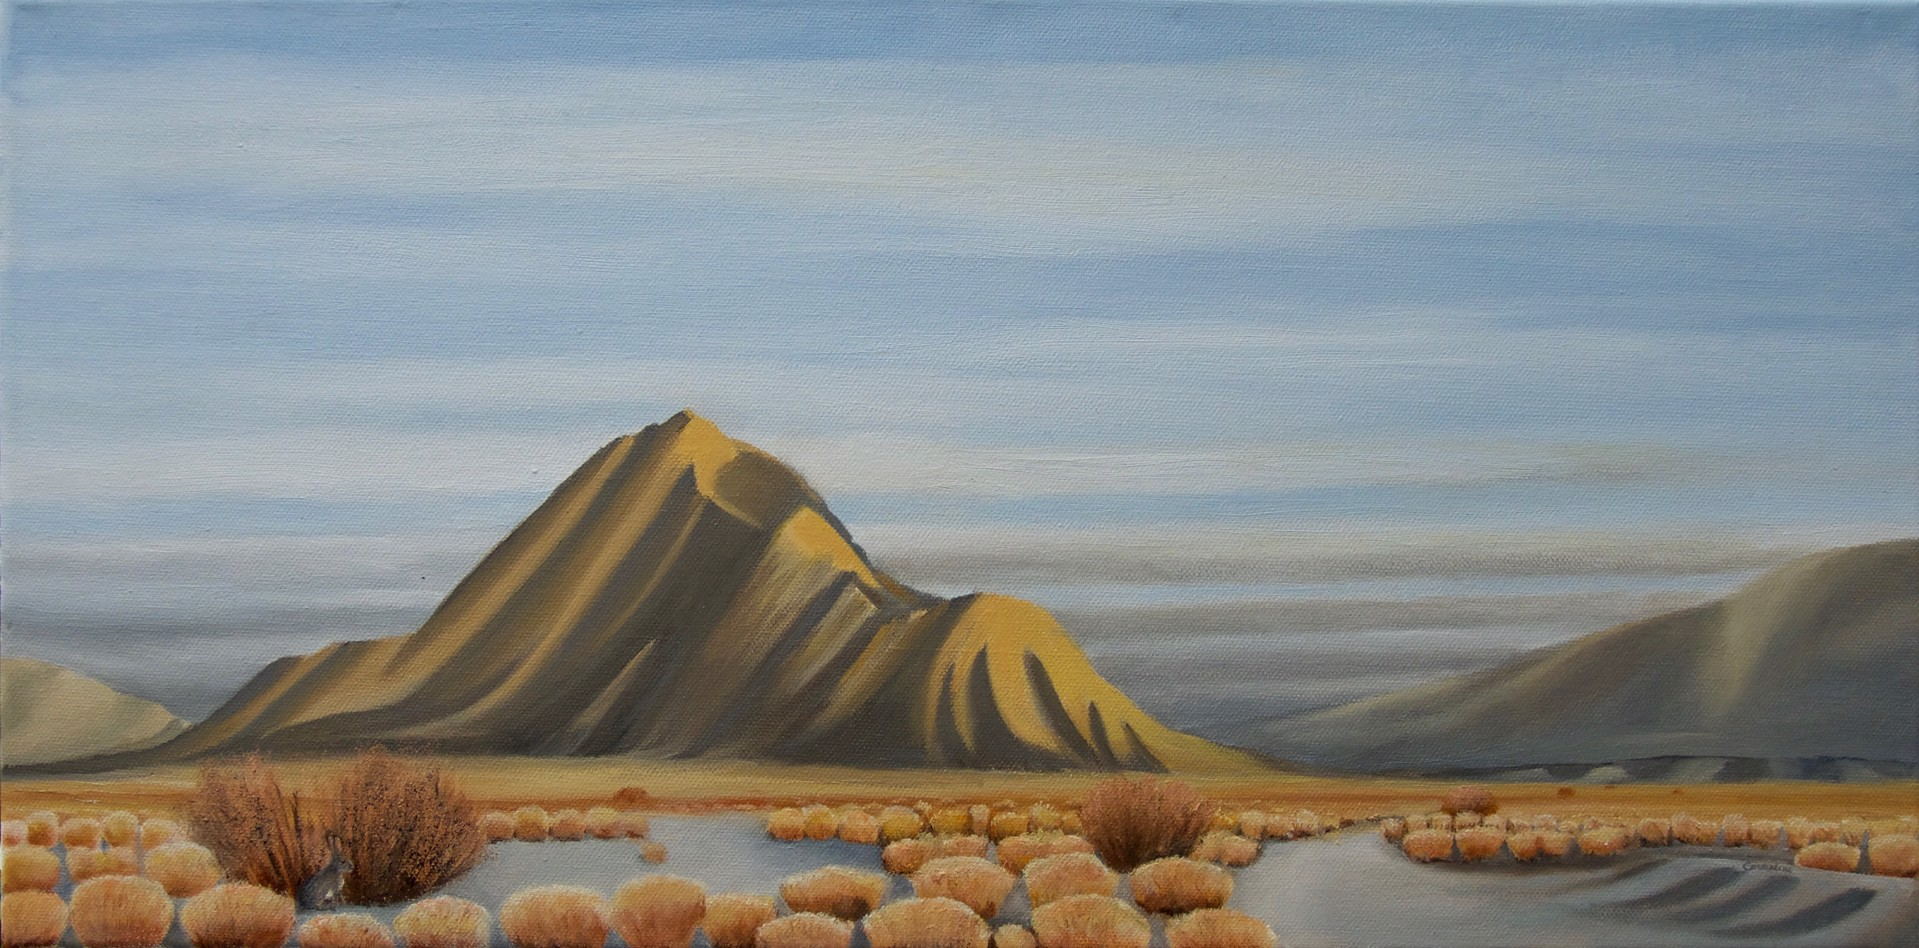 Desert Sentinel by Don Cornelius